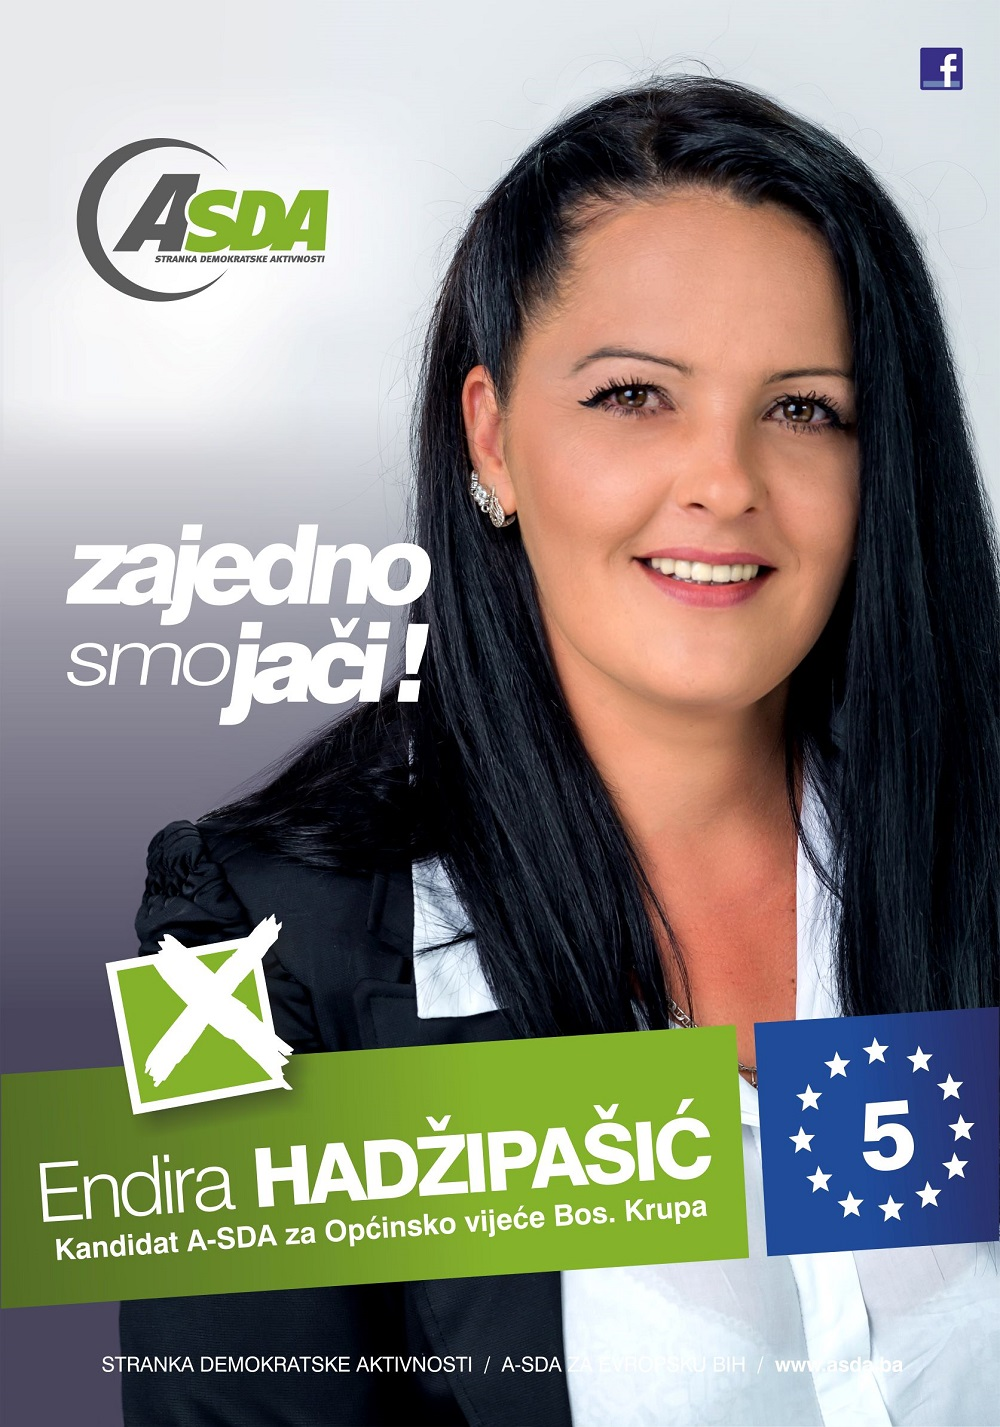 Endira Hadžipašić